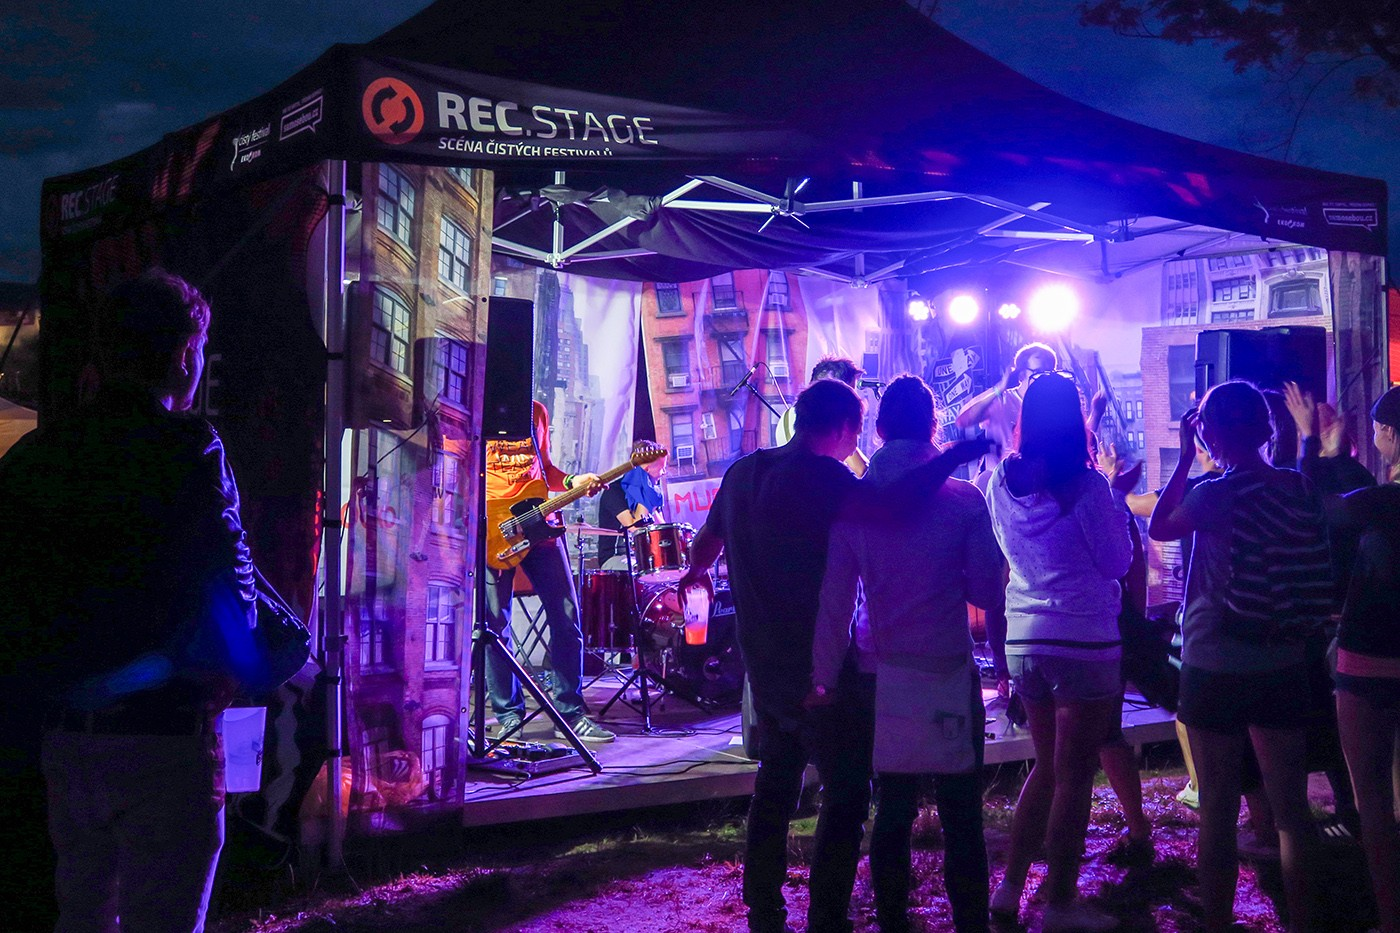 rec_stage_samosebou_festivaly